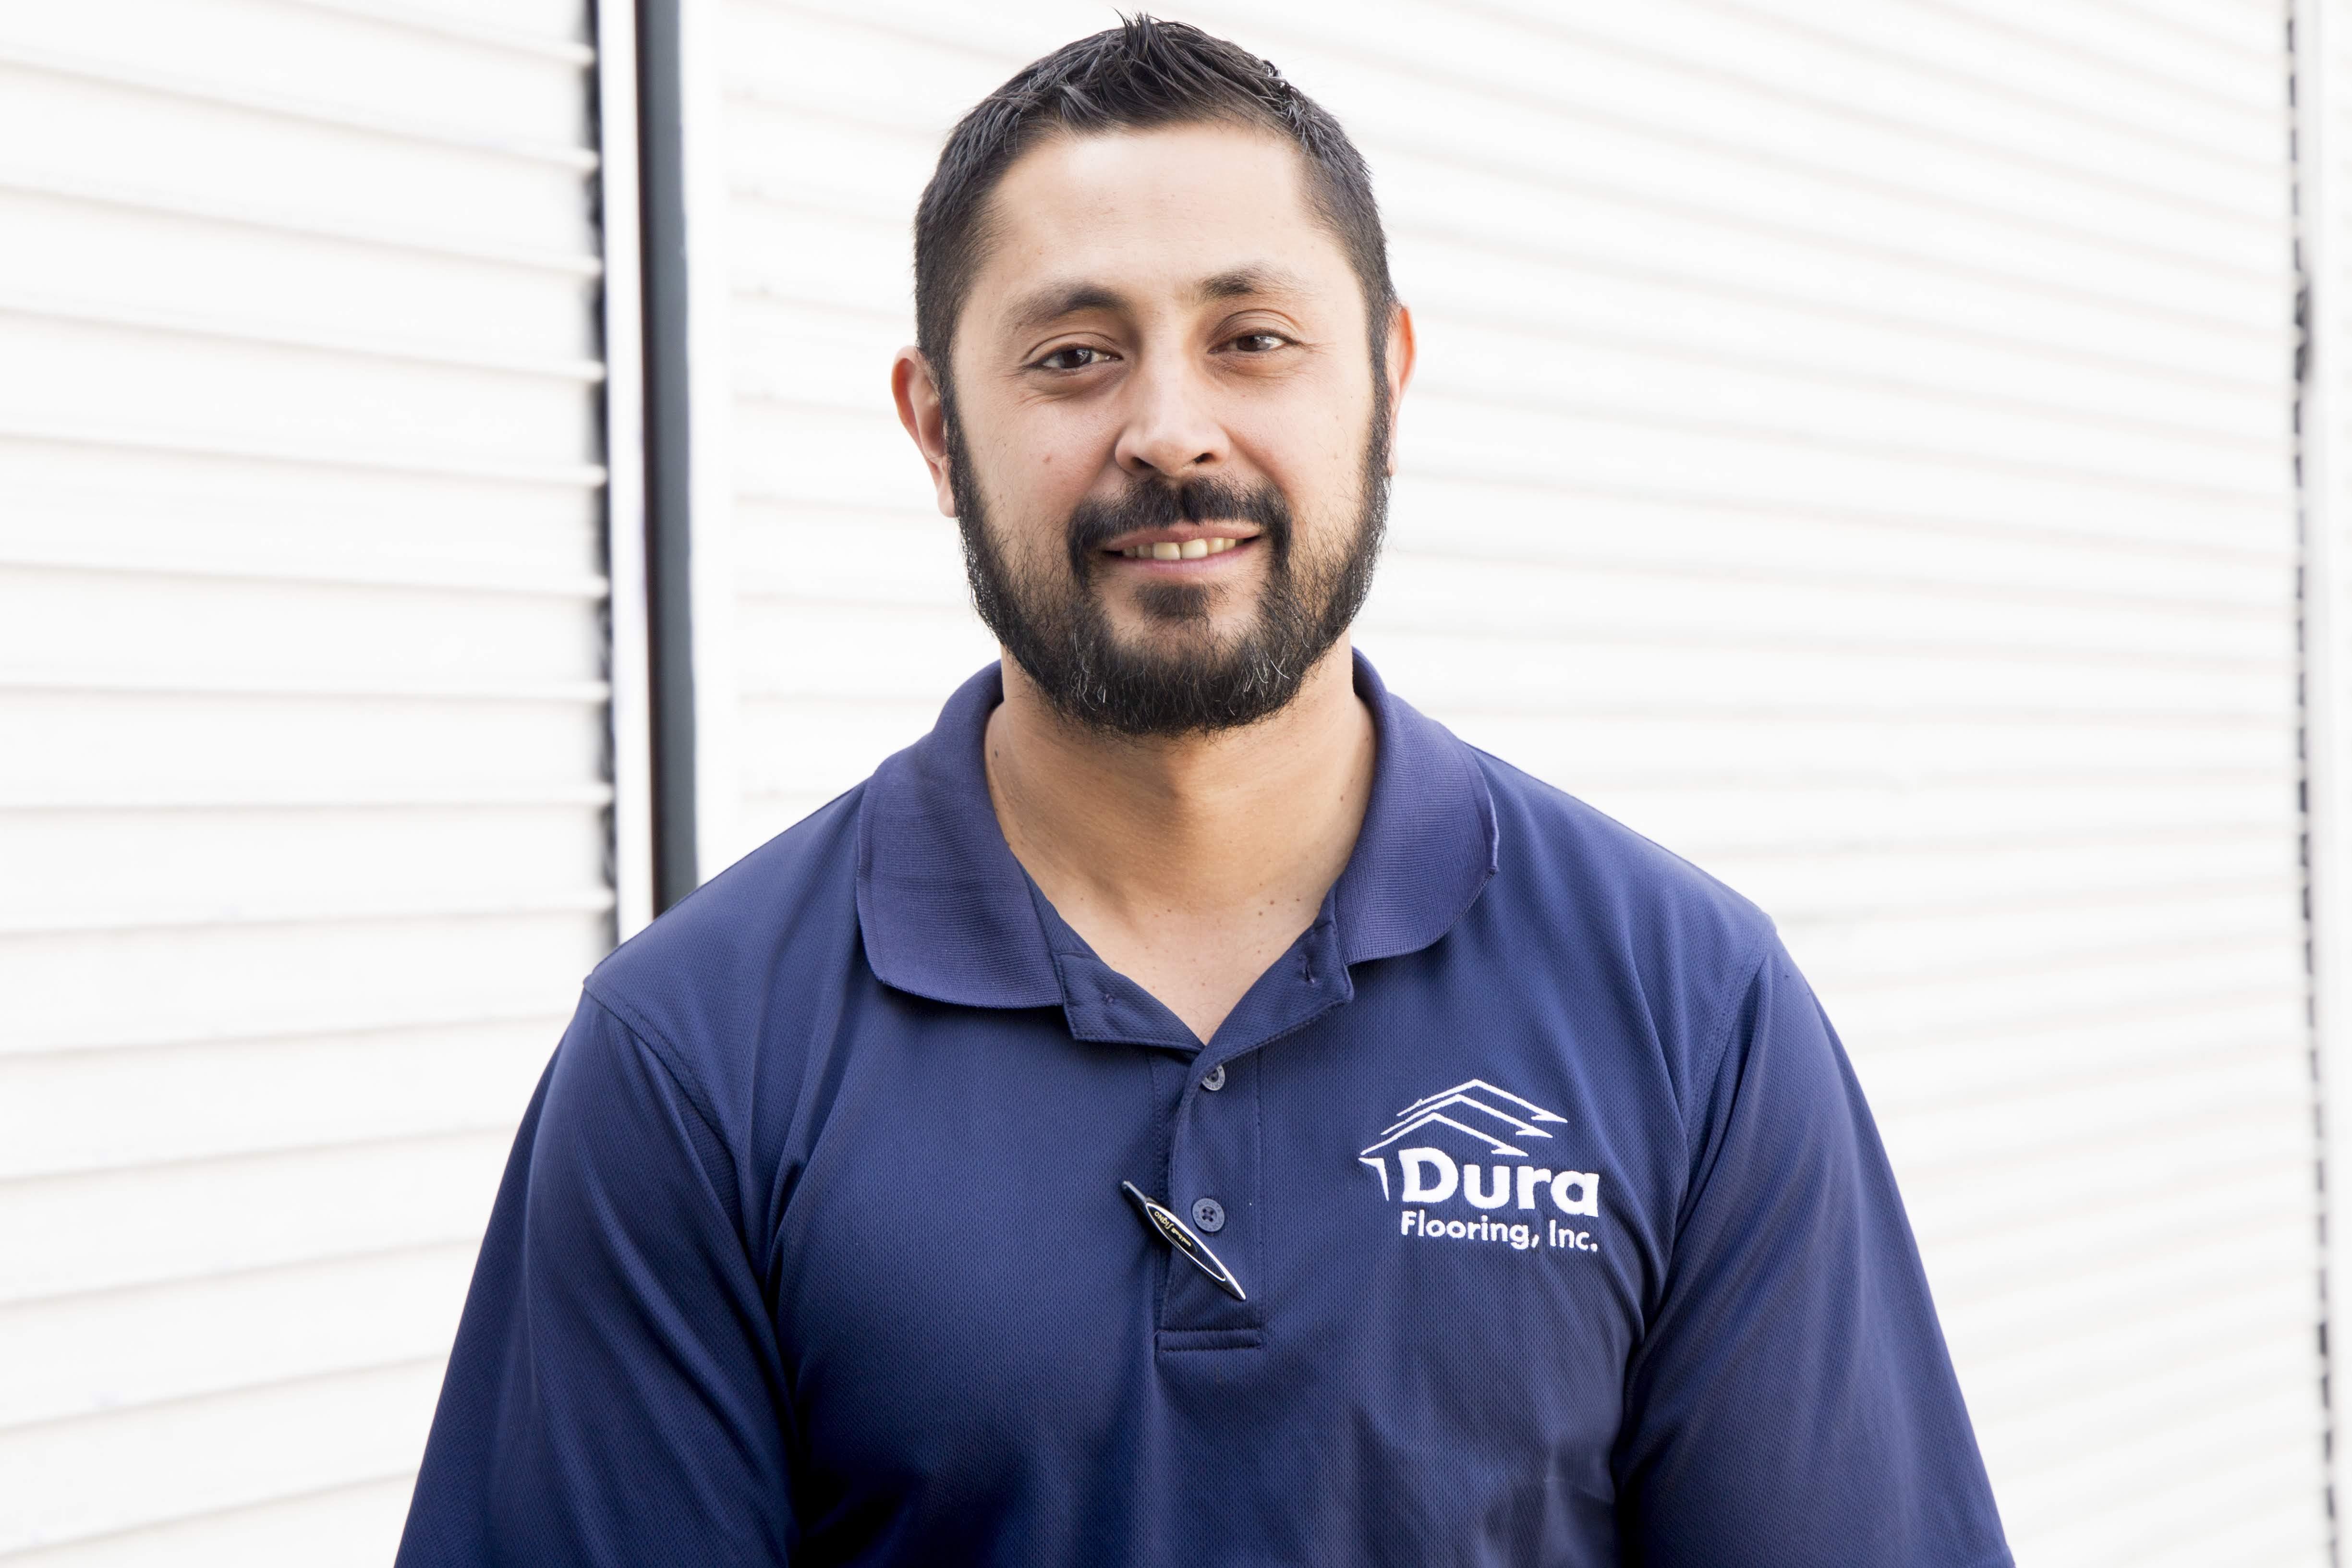 Manny, Installations Rep at Dura Flooring, Inc